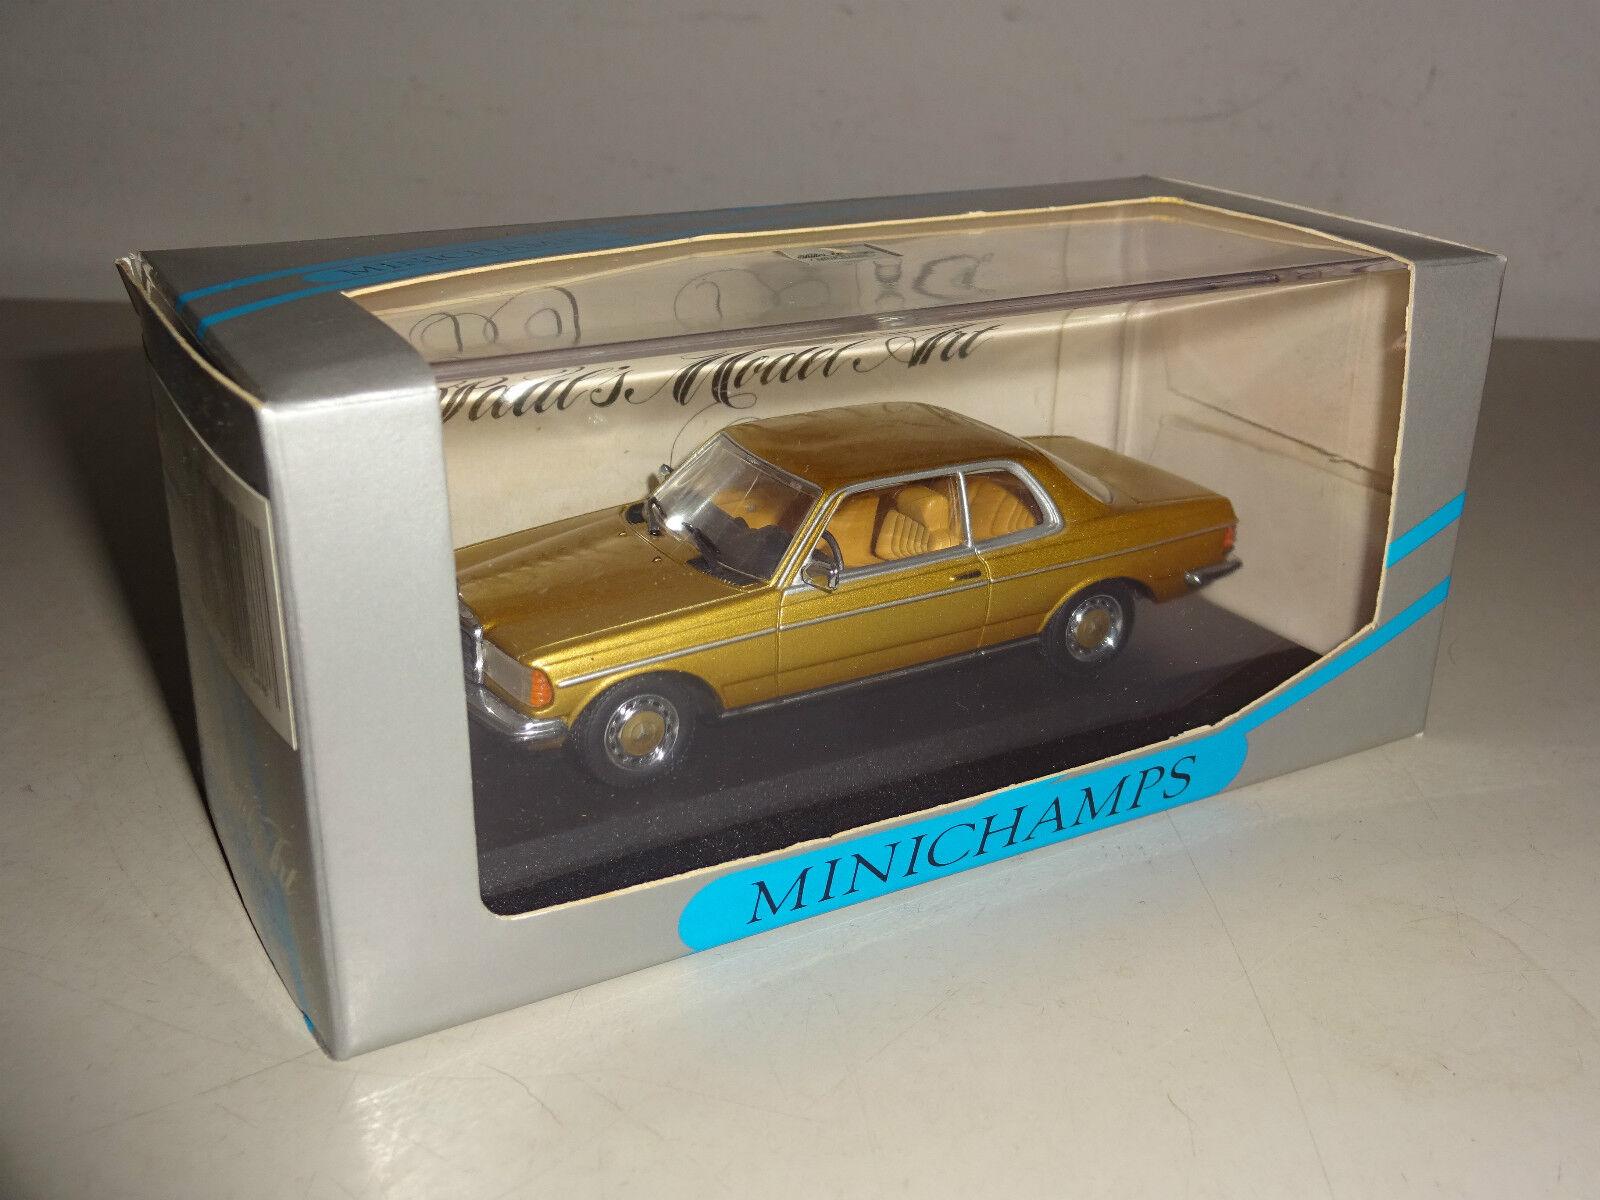 Mercedes-Benz W 123 coupe 230 EC gold metallic-Minichamps 1 43